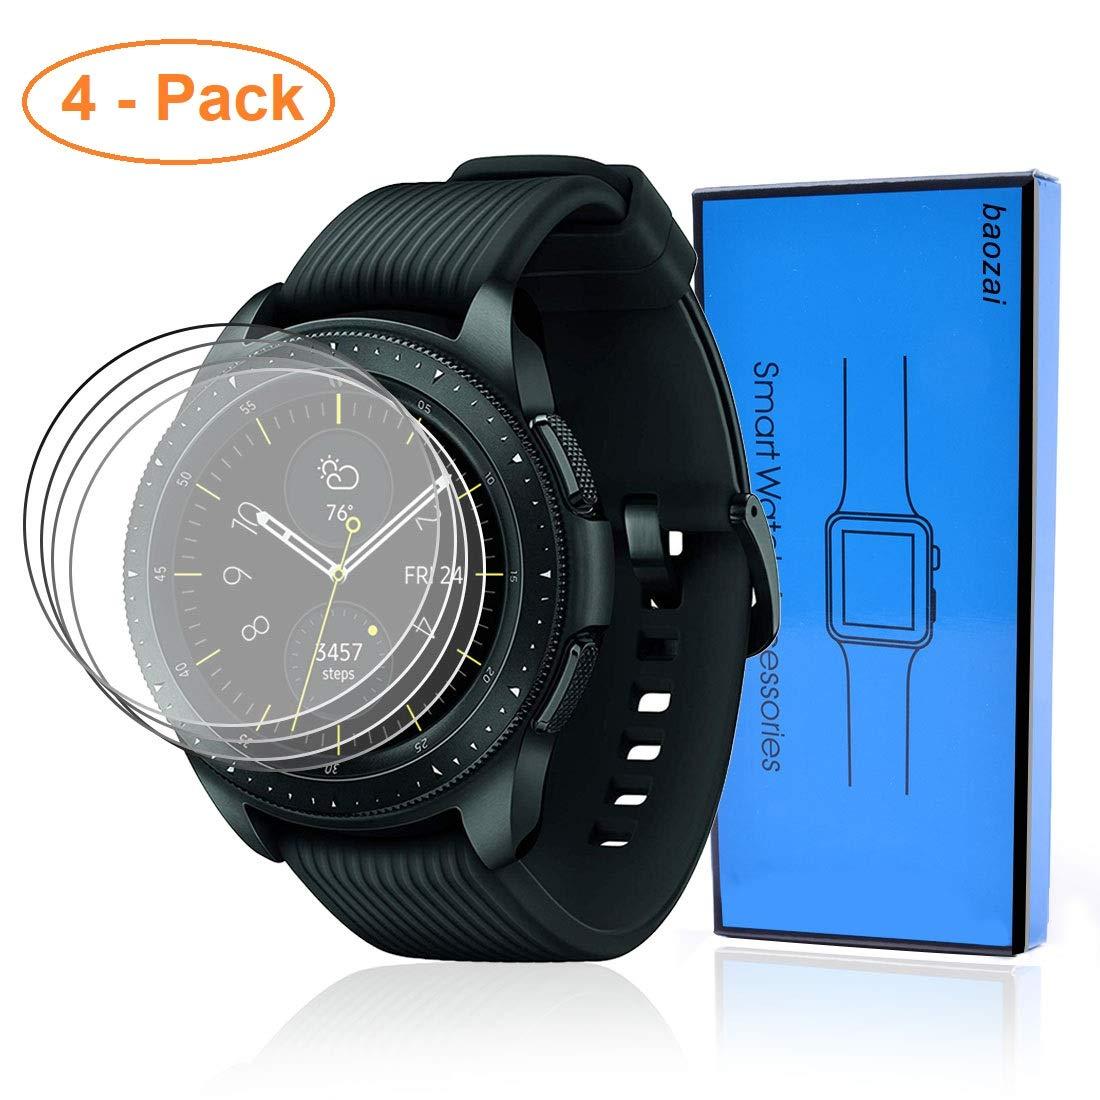 Vidrio Protector para Galaxy Watch 42mm x4 BAOZAI -7H4GP8PS